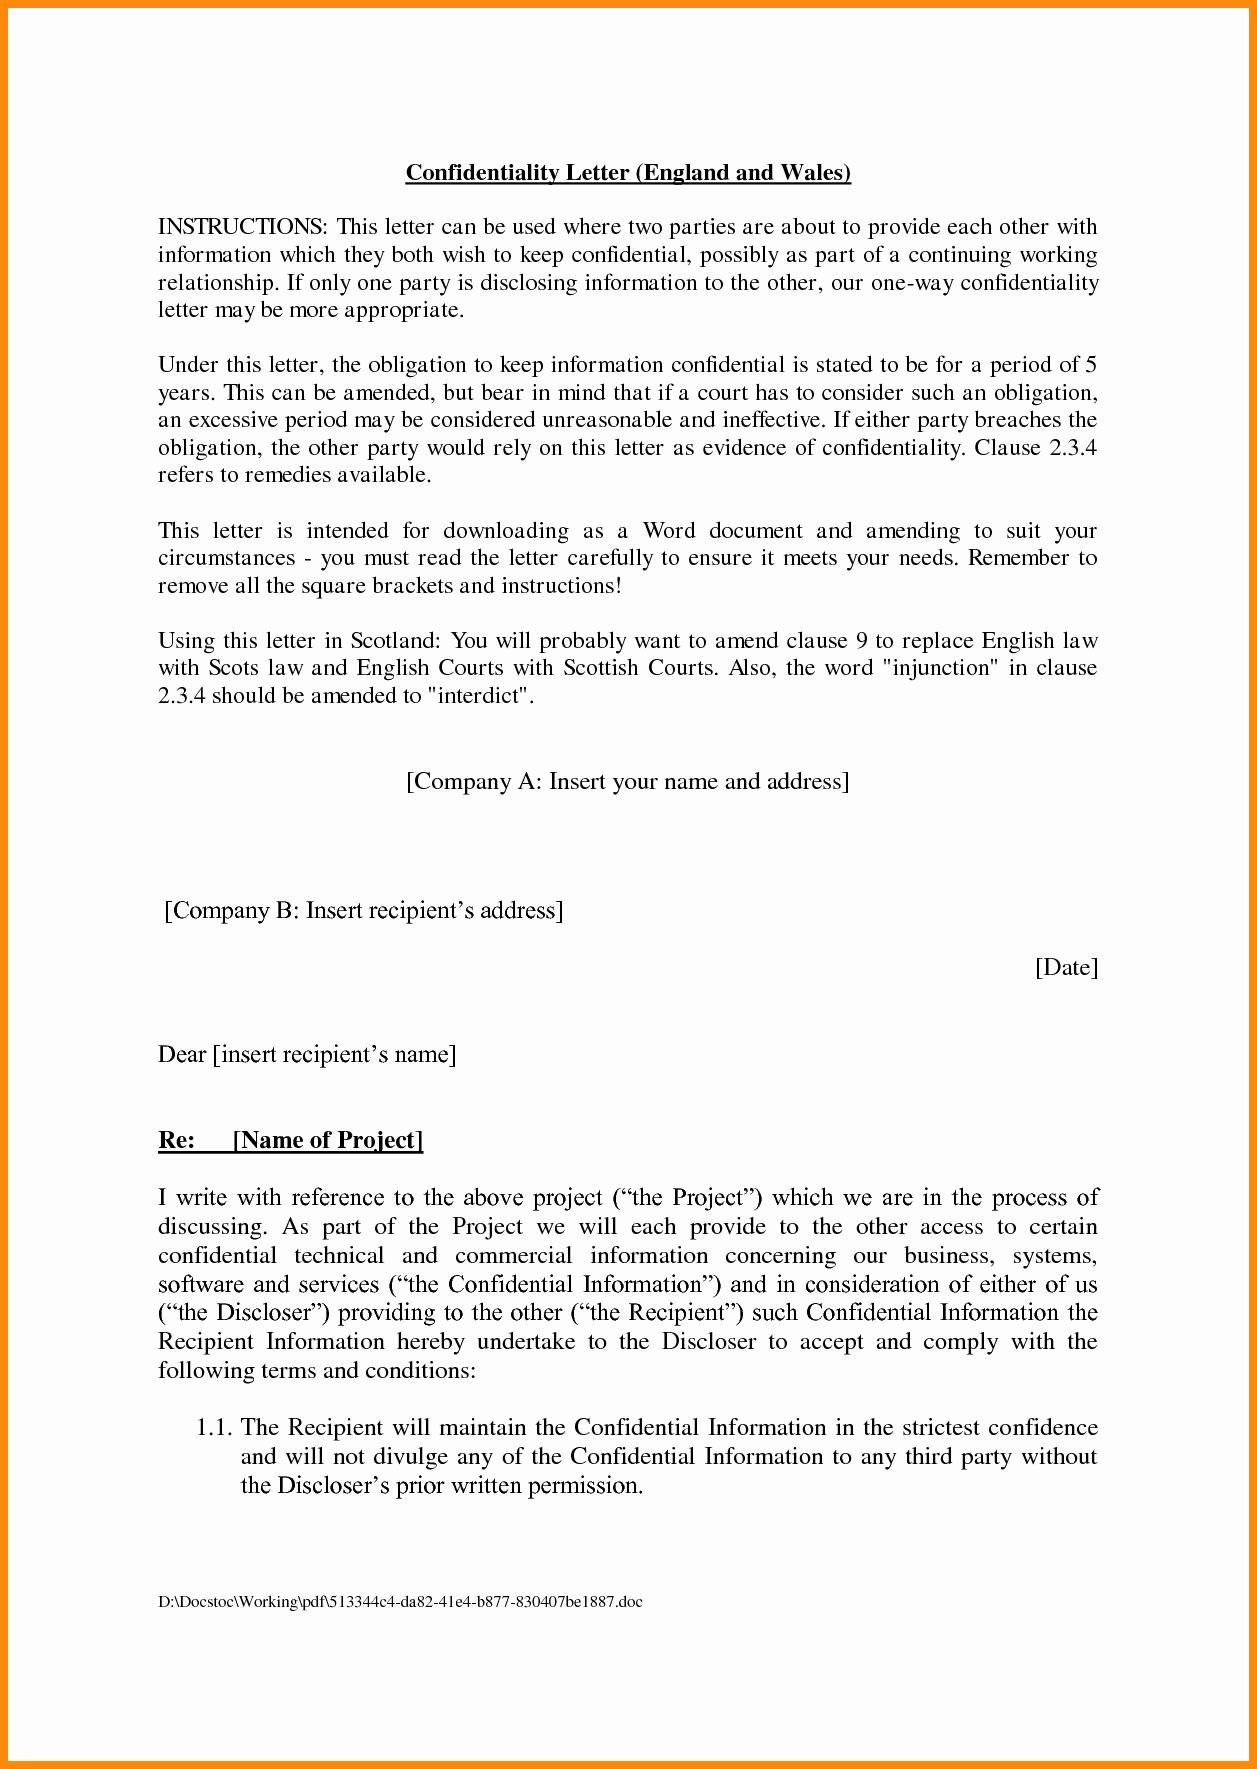 Agreement Template Between Two Parties Best Of Agreement Letter Between Two Parties